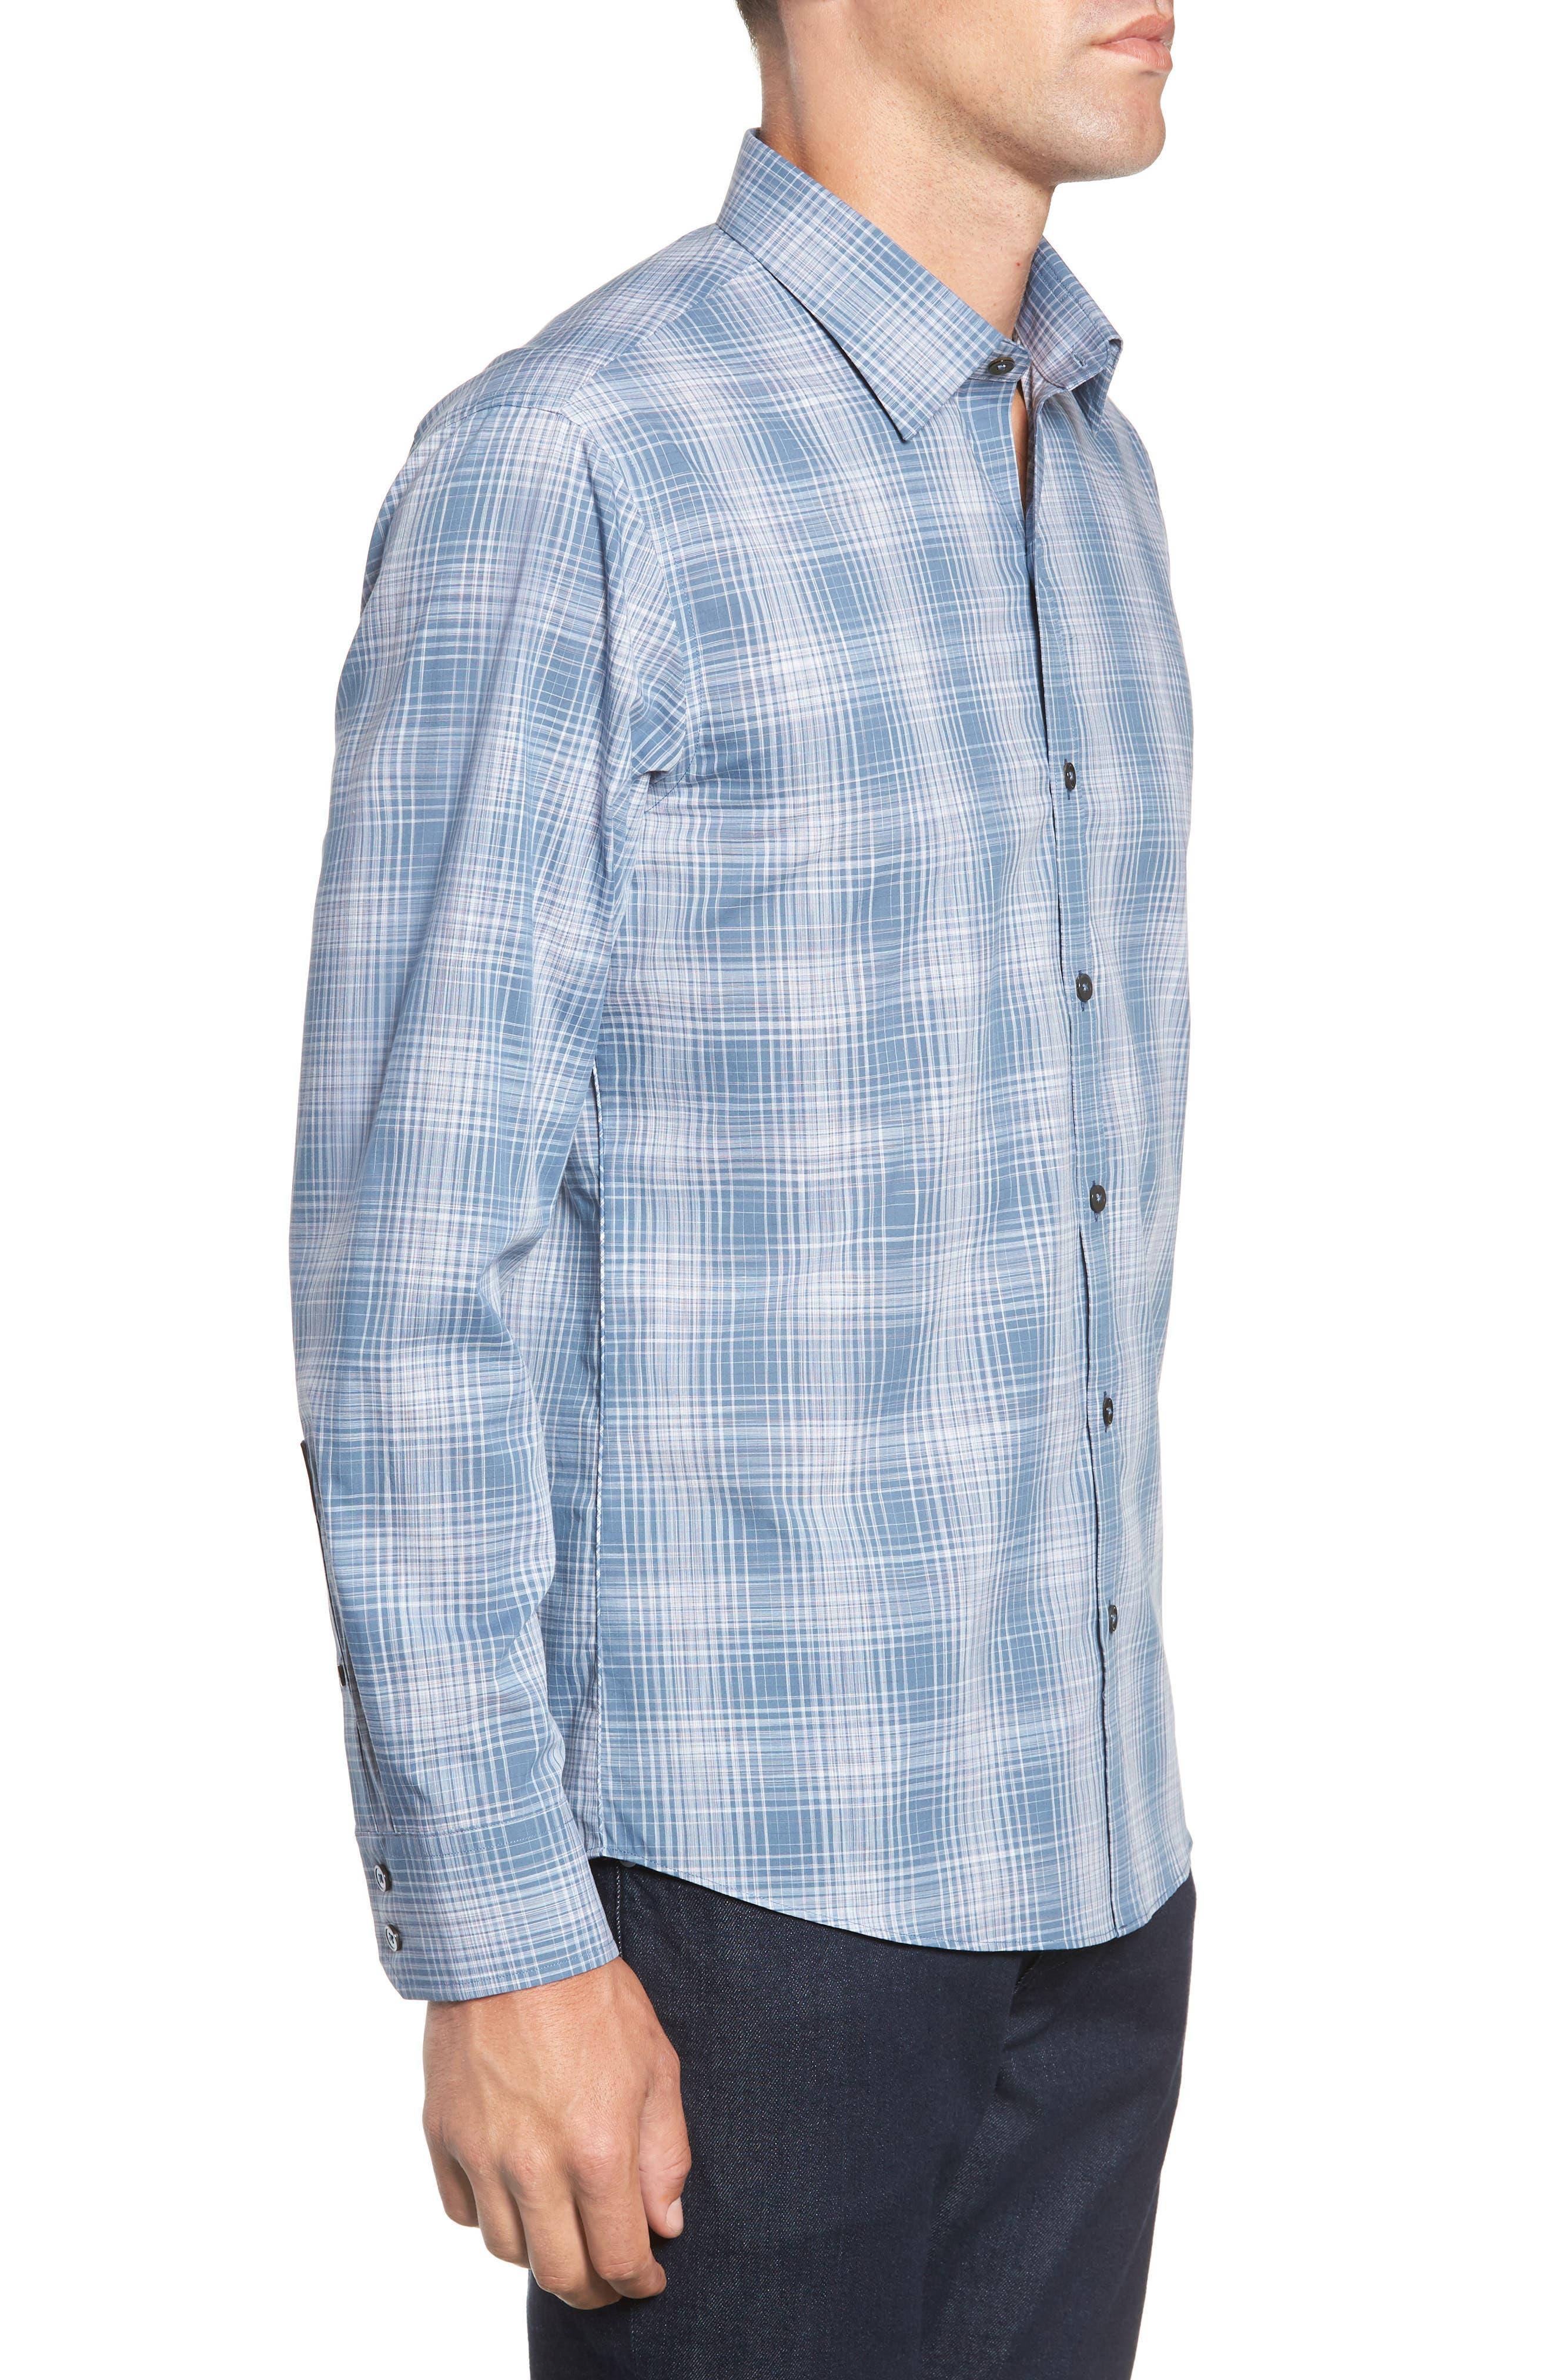 Slater Check Sport Shirt,                             Alternate thumbnail 4, color,                             PALE BLUE